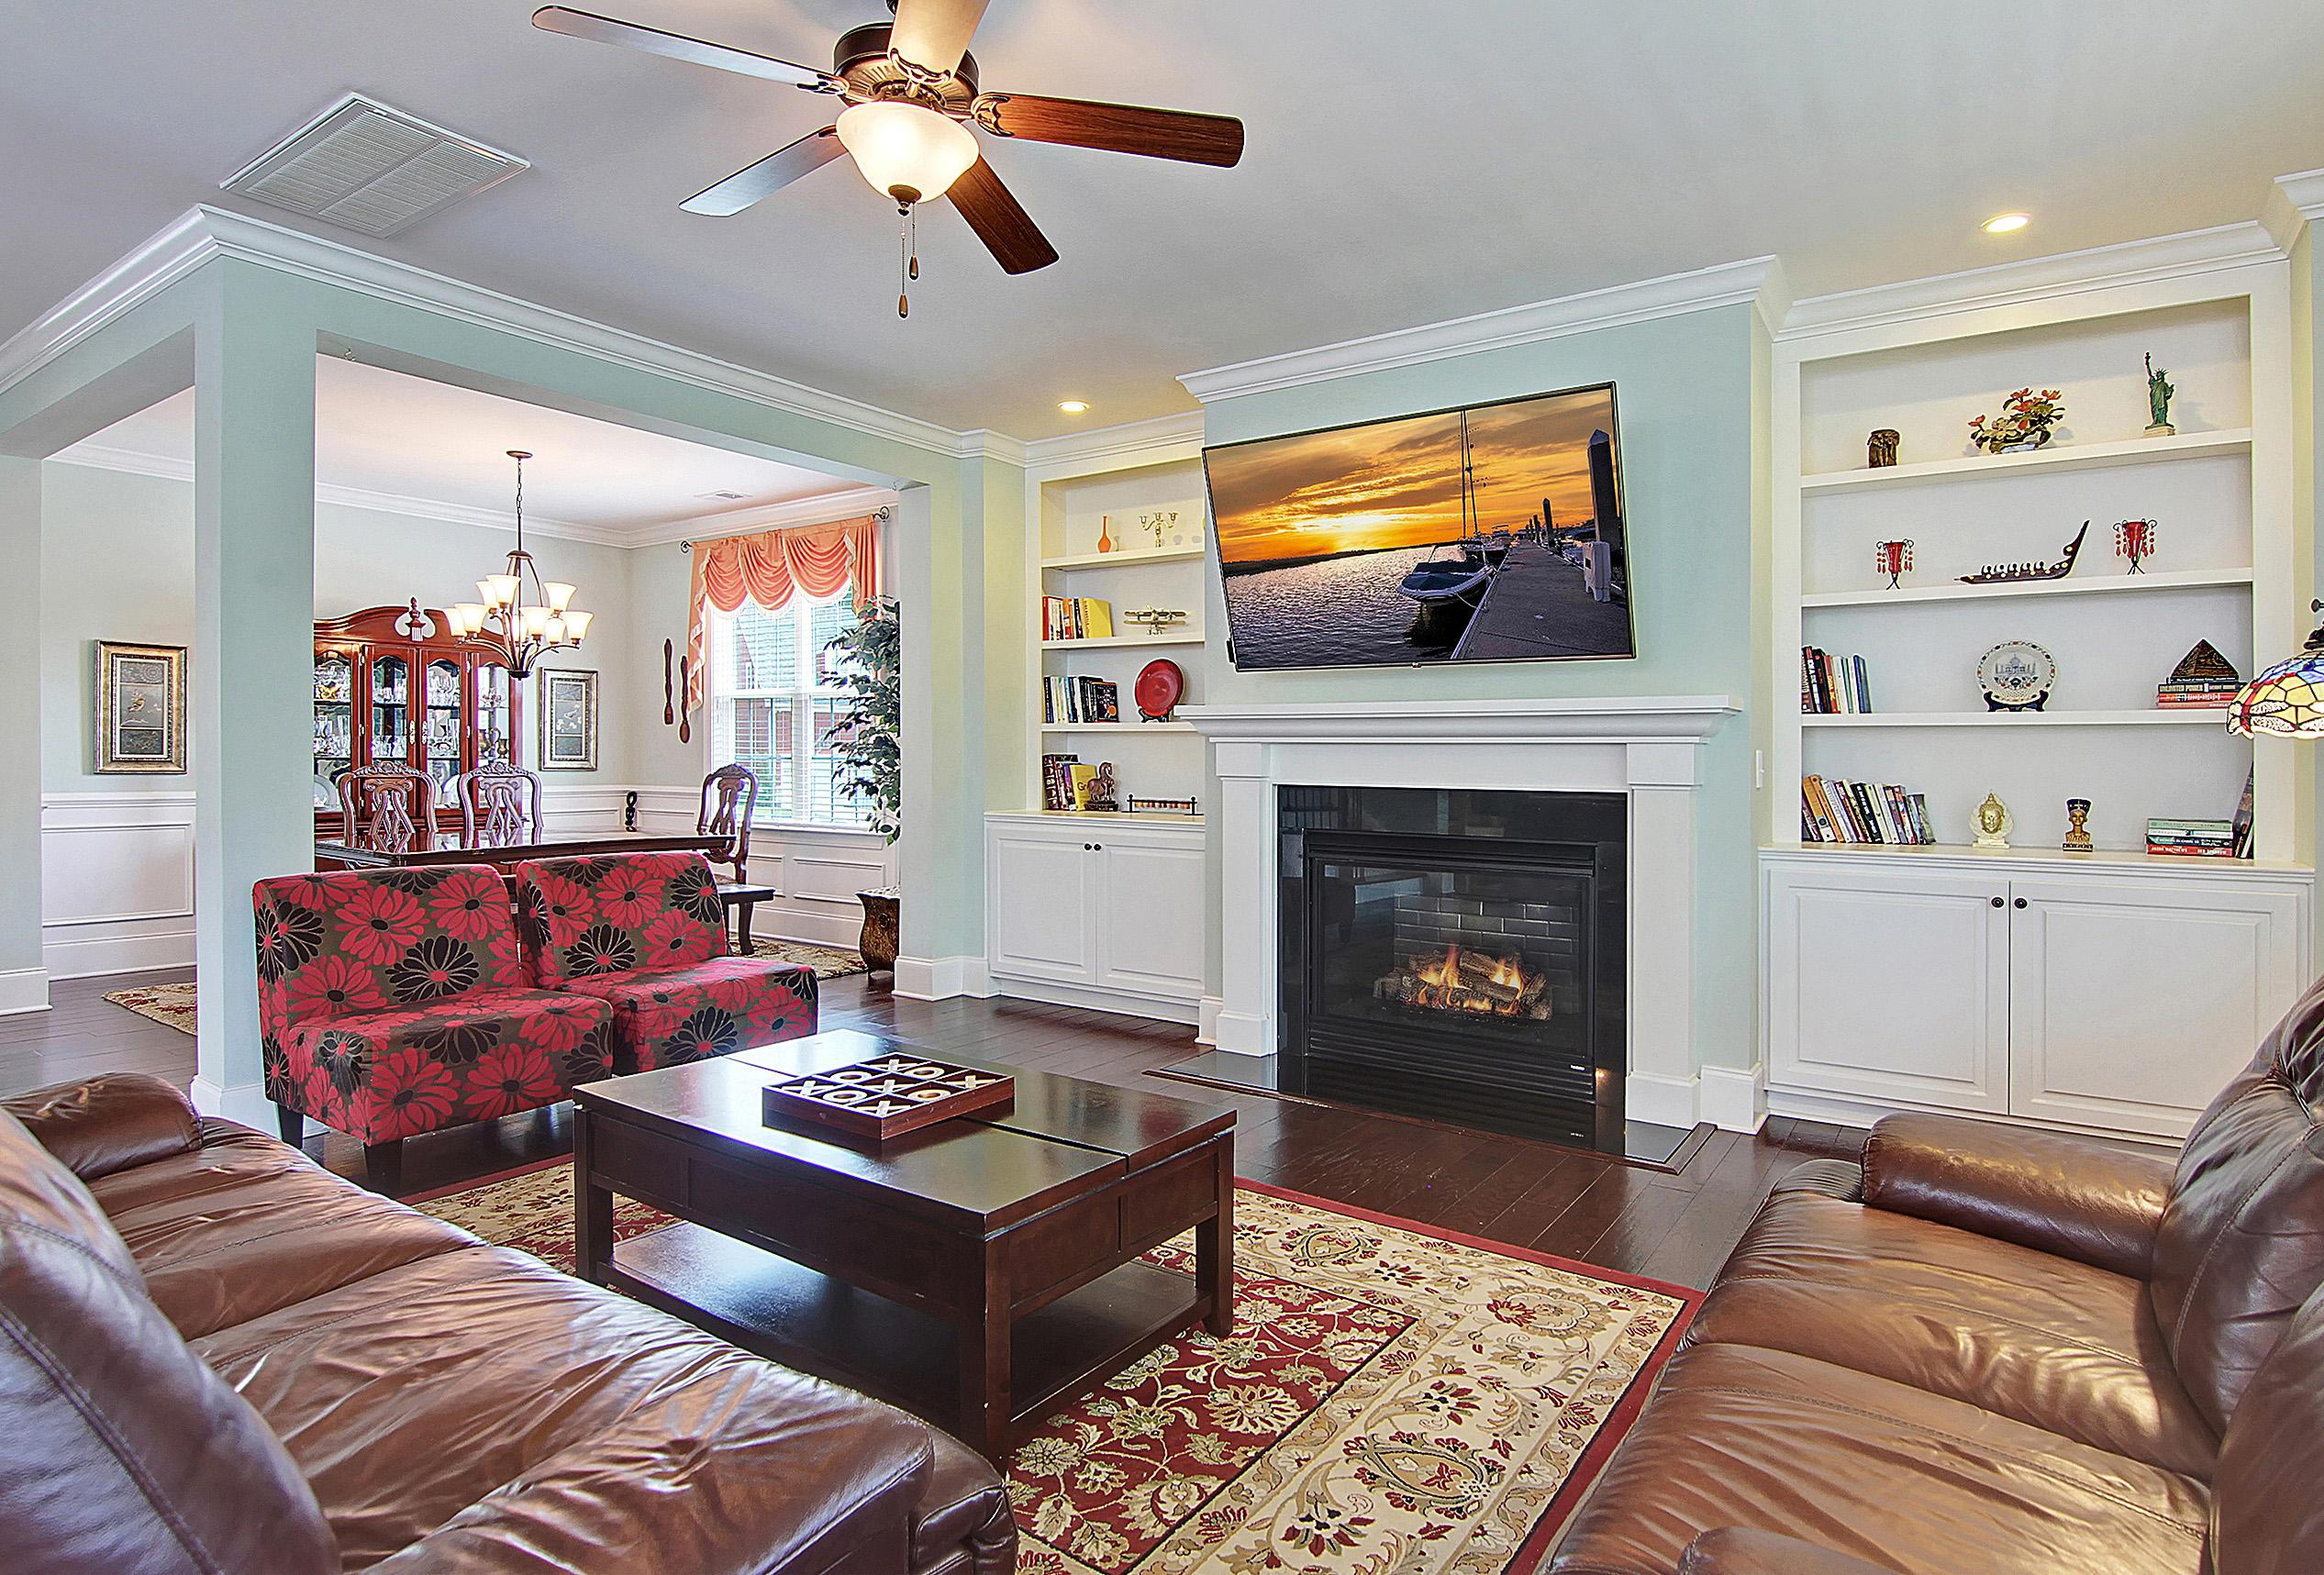 Dunes West Homes For Sale - 1332 Whisker Pole, Mount Pleasant, SC - 12